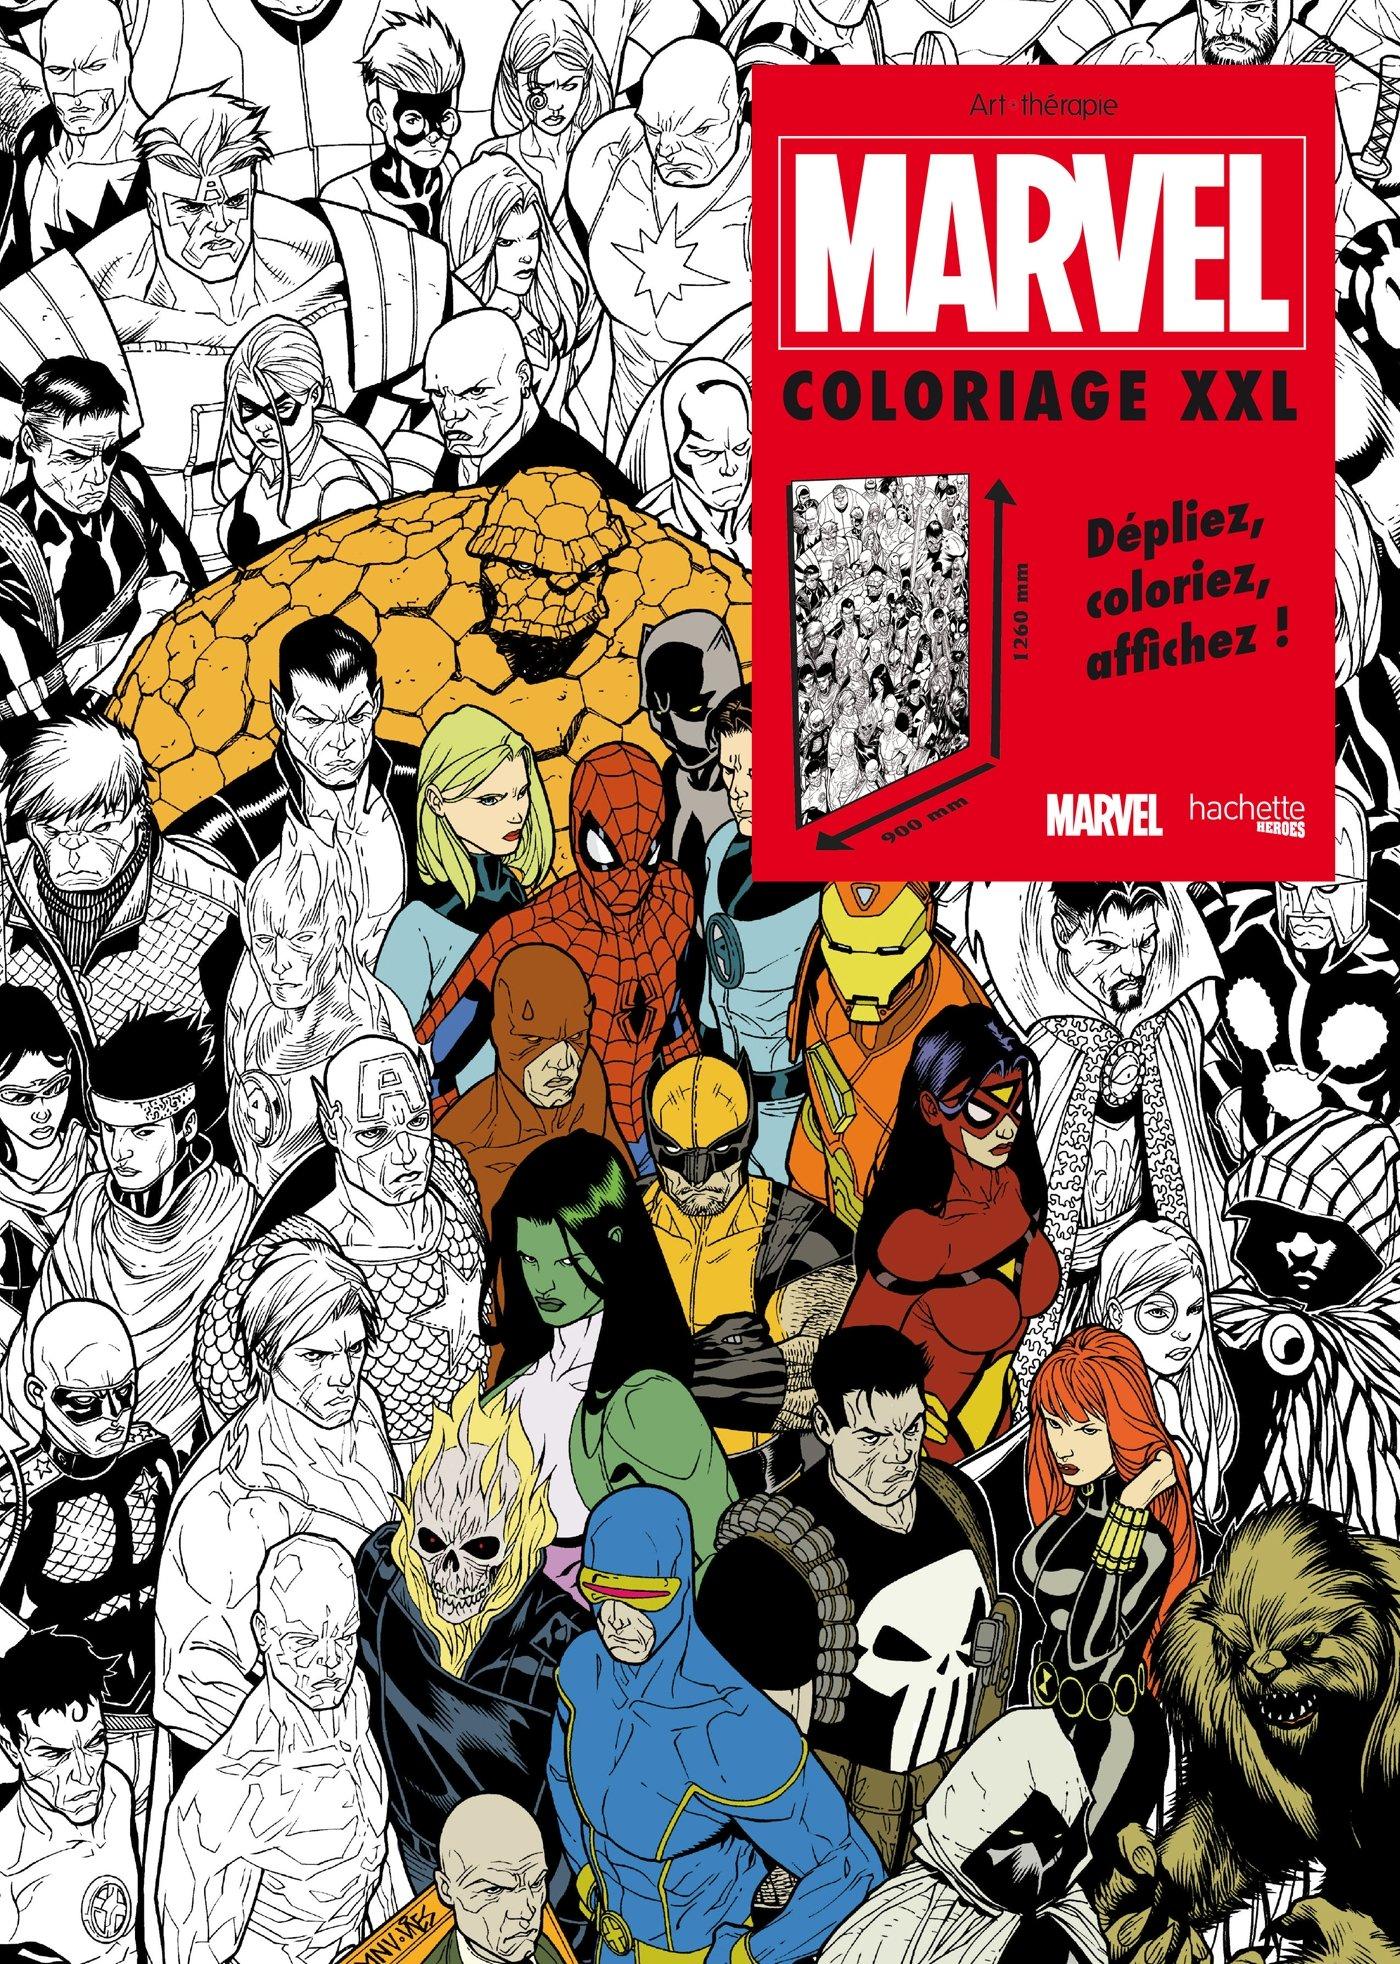 marvel coloriage xxl amazoncouk nicolas beaujouan 9782011461131 books - Marvel Coloriage